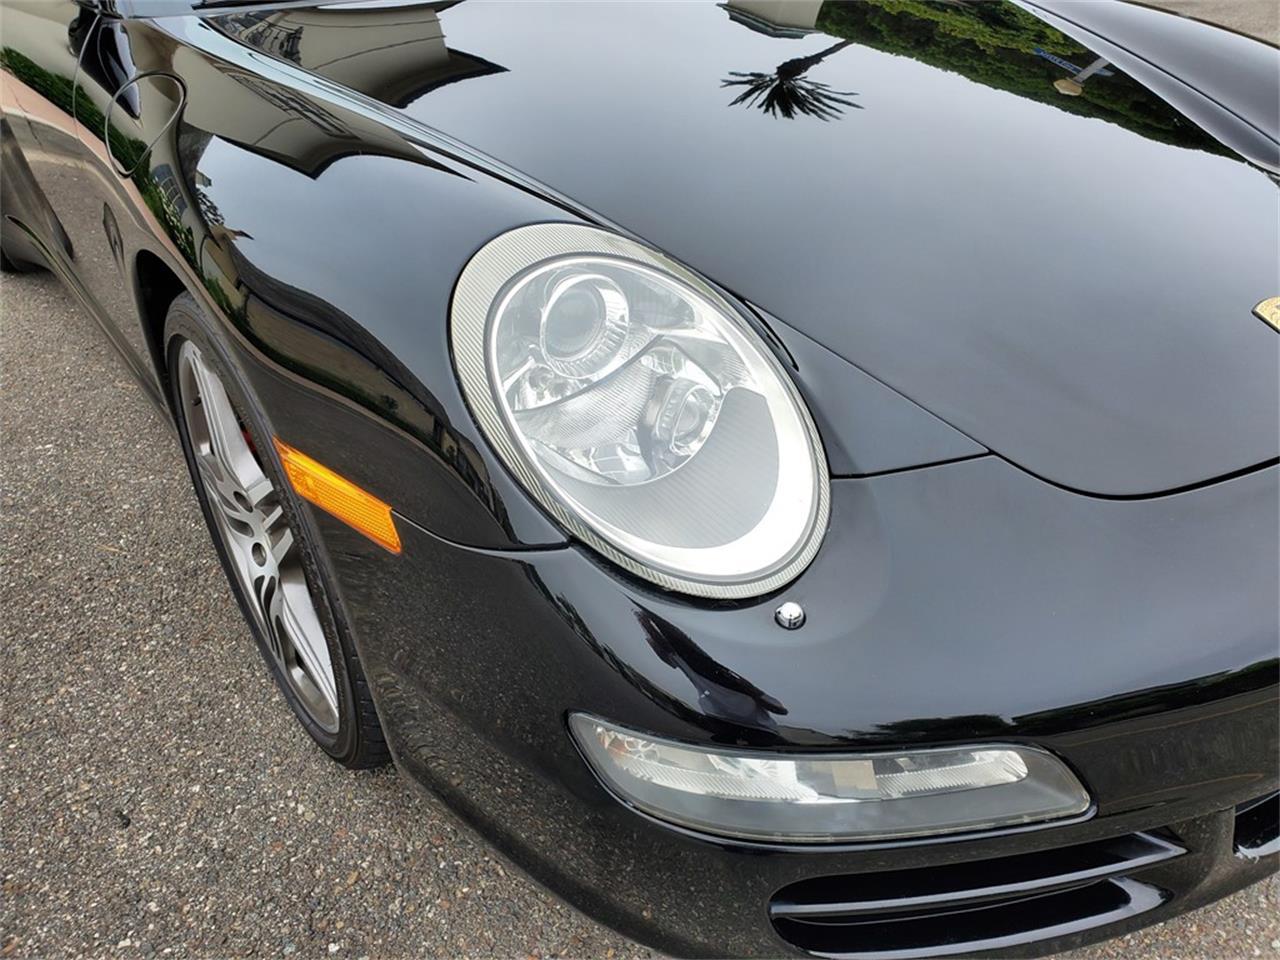 Large Picture of 2007 Porsche 911 Carrera 4S located in California - $29,990.00 - QT04